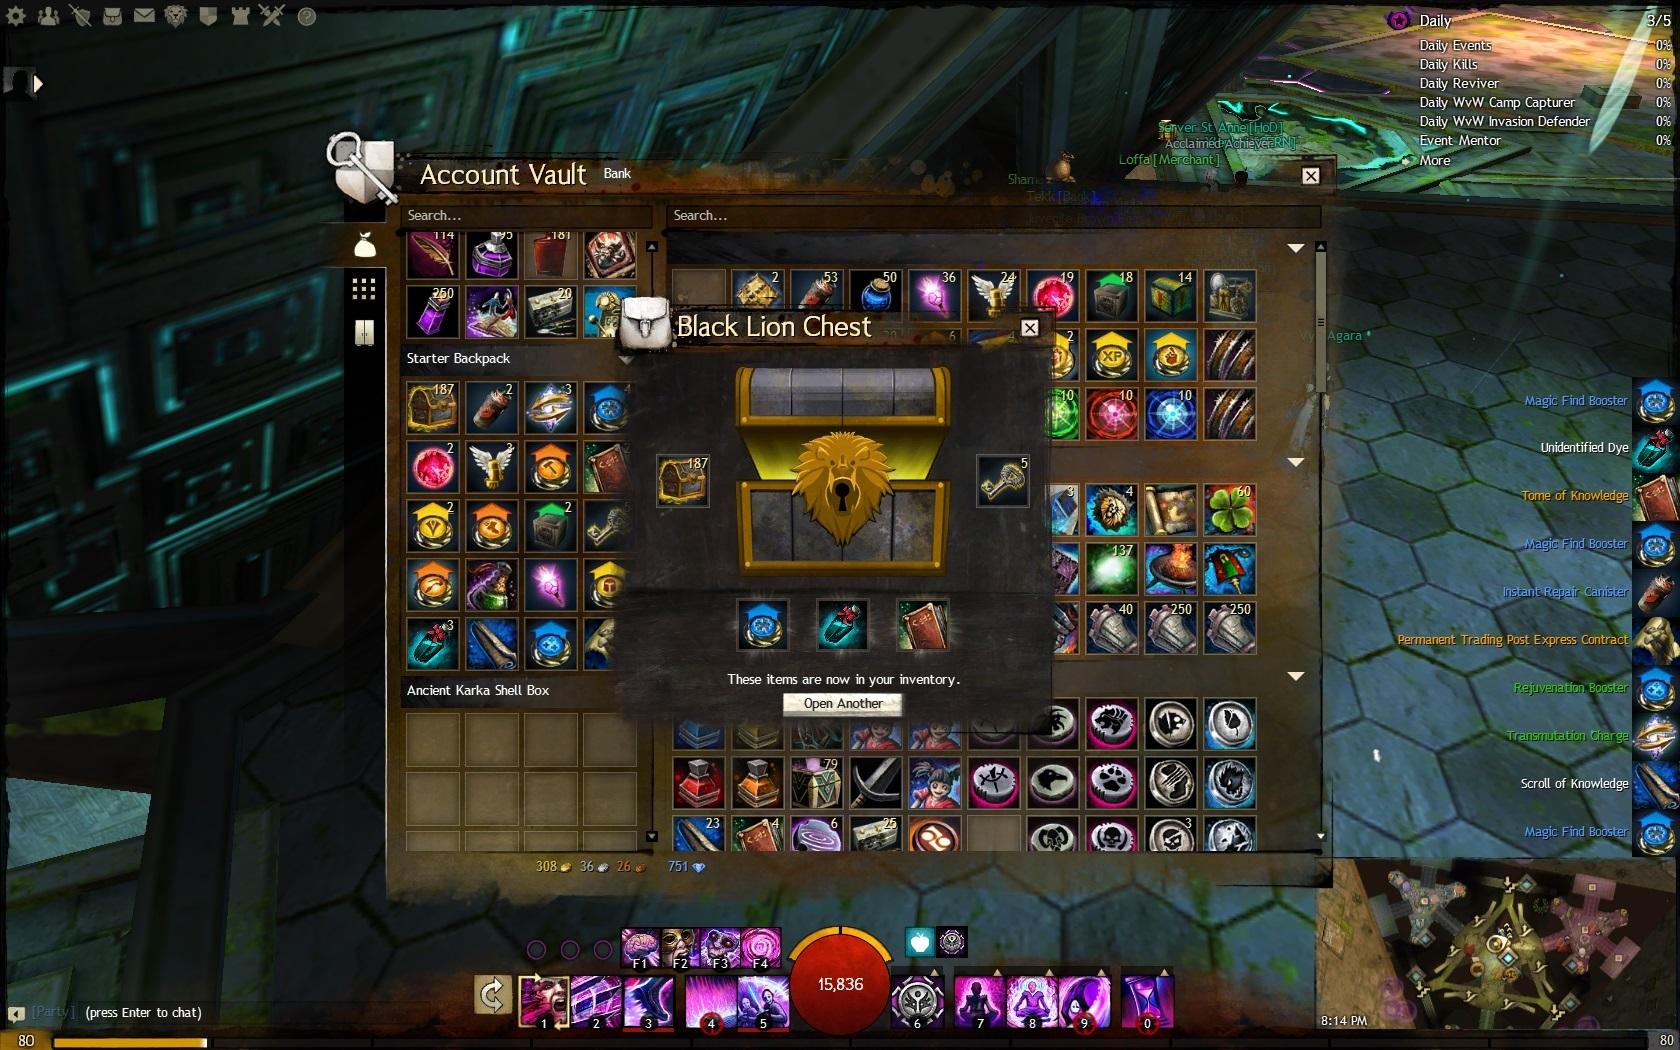 guild wars 2 forum - black lion trading co - 100 keys - no very